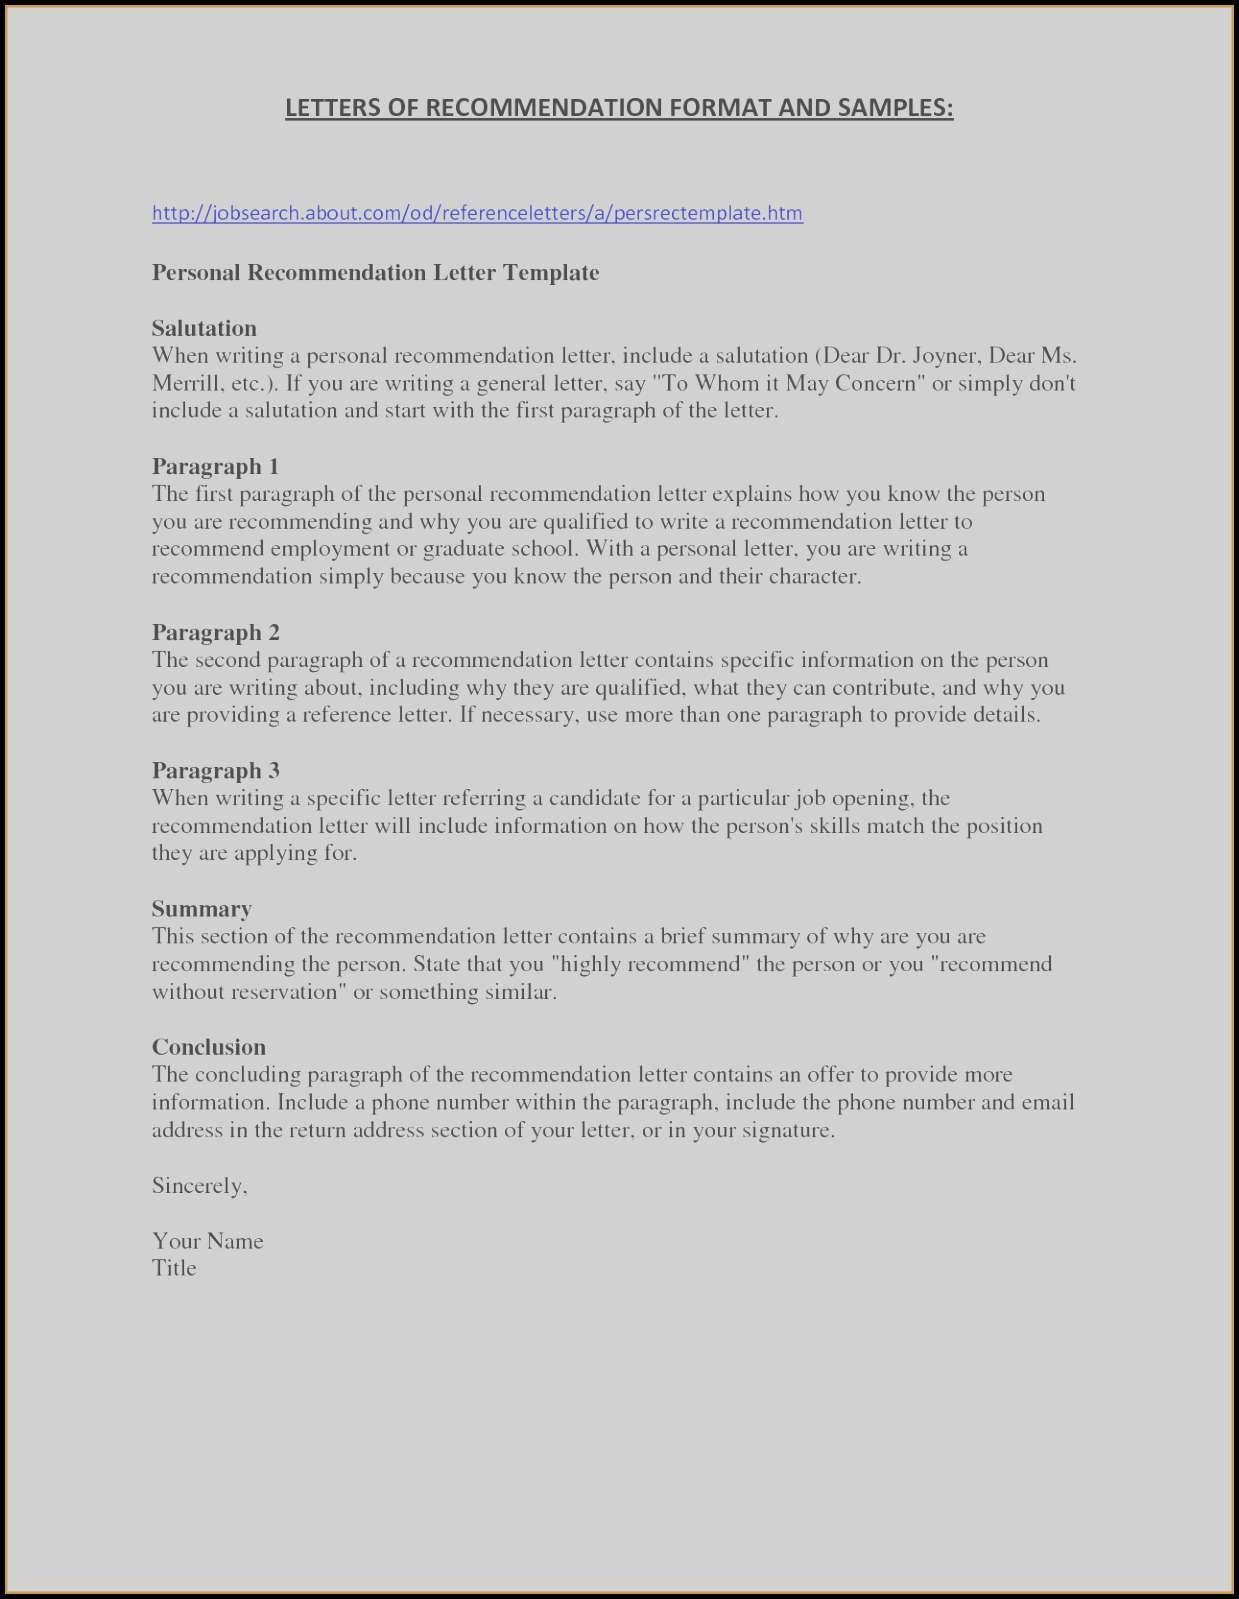 Nursing School Recommendation Letter Template - Sample Re Mendation Letter for Job Inspirationa Nursing School Re